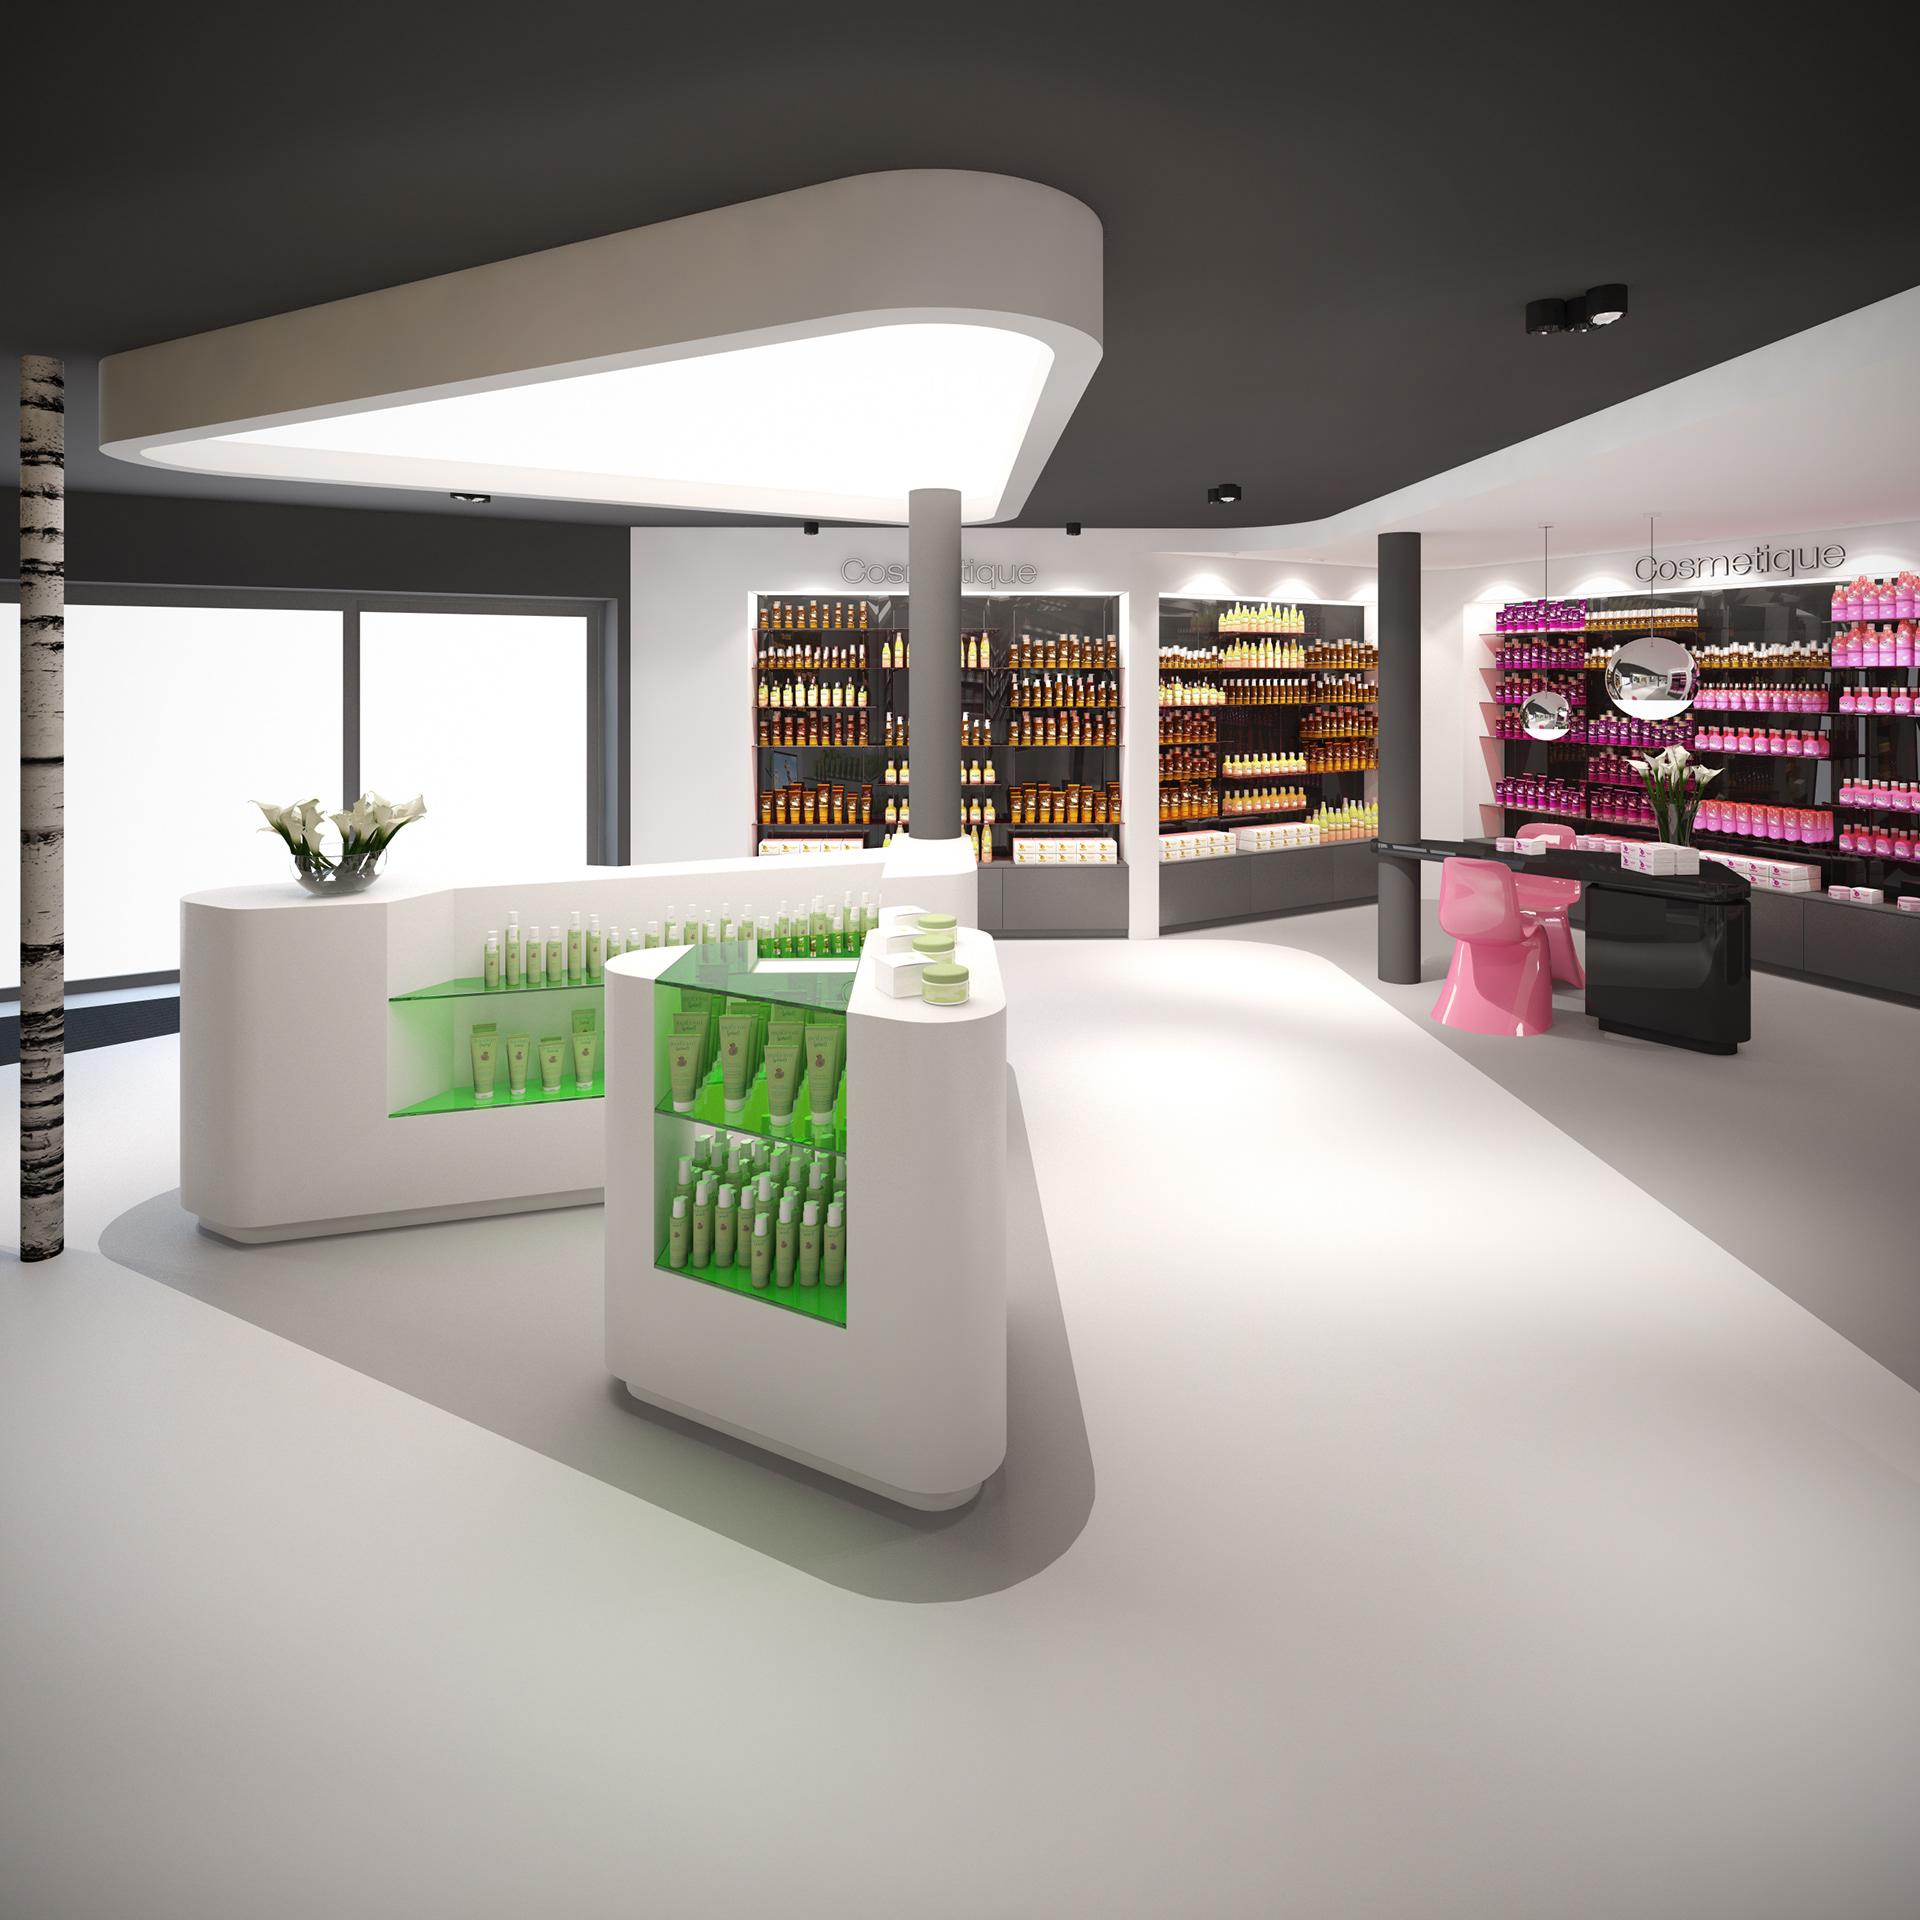 3d lab visualisaties interieur 2014 viz collection of pharmacy